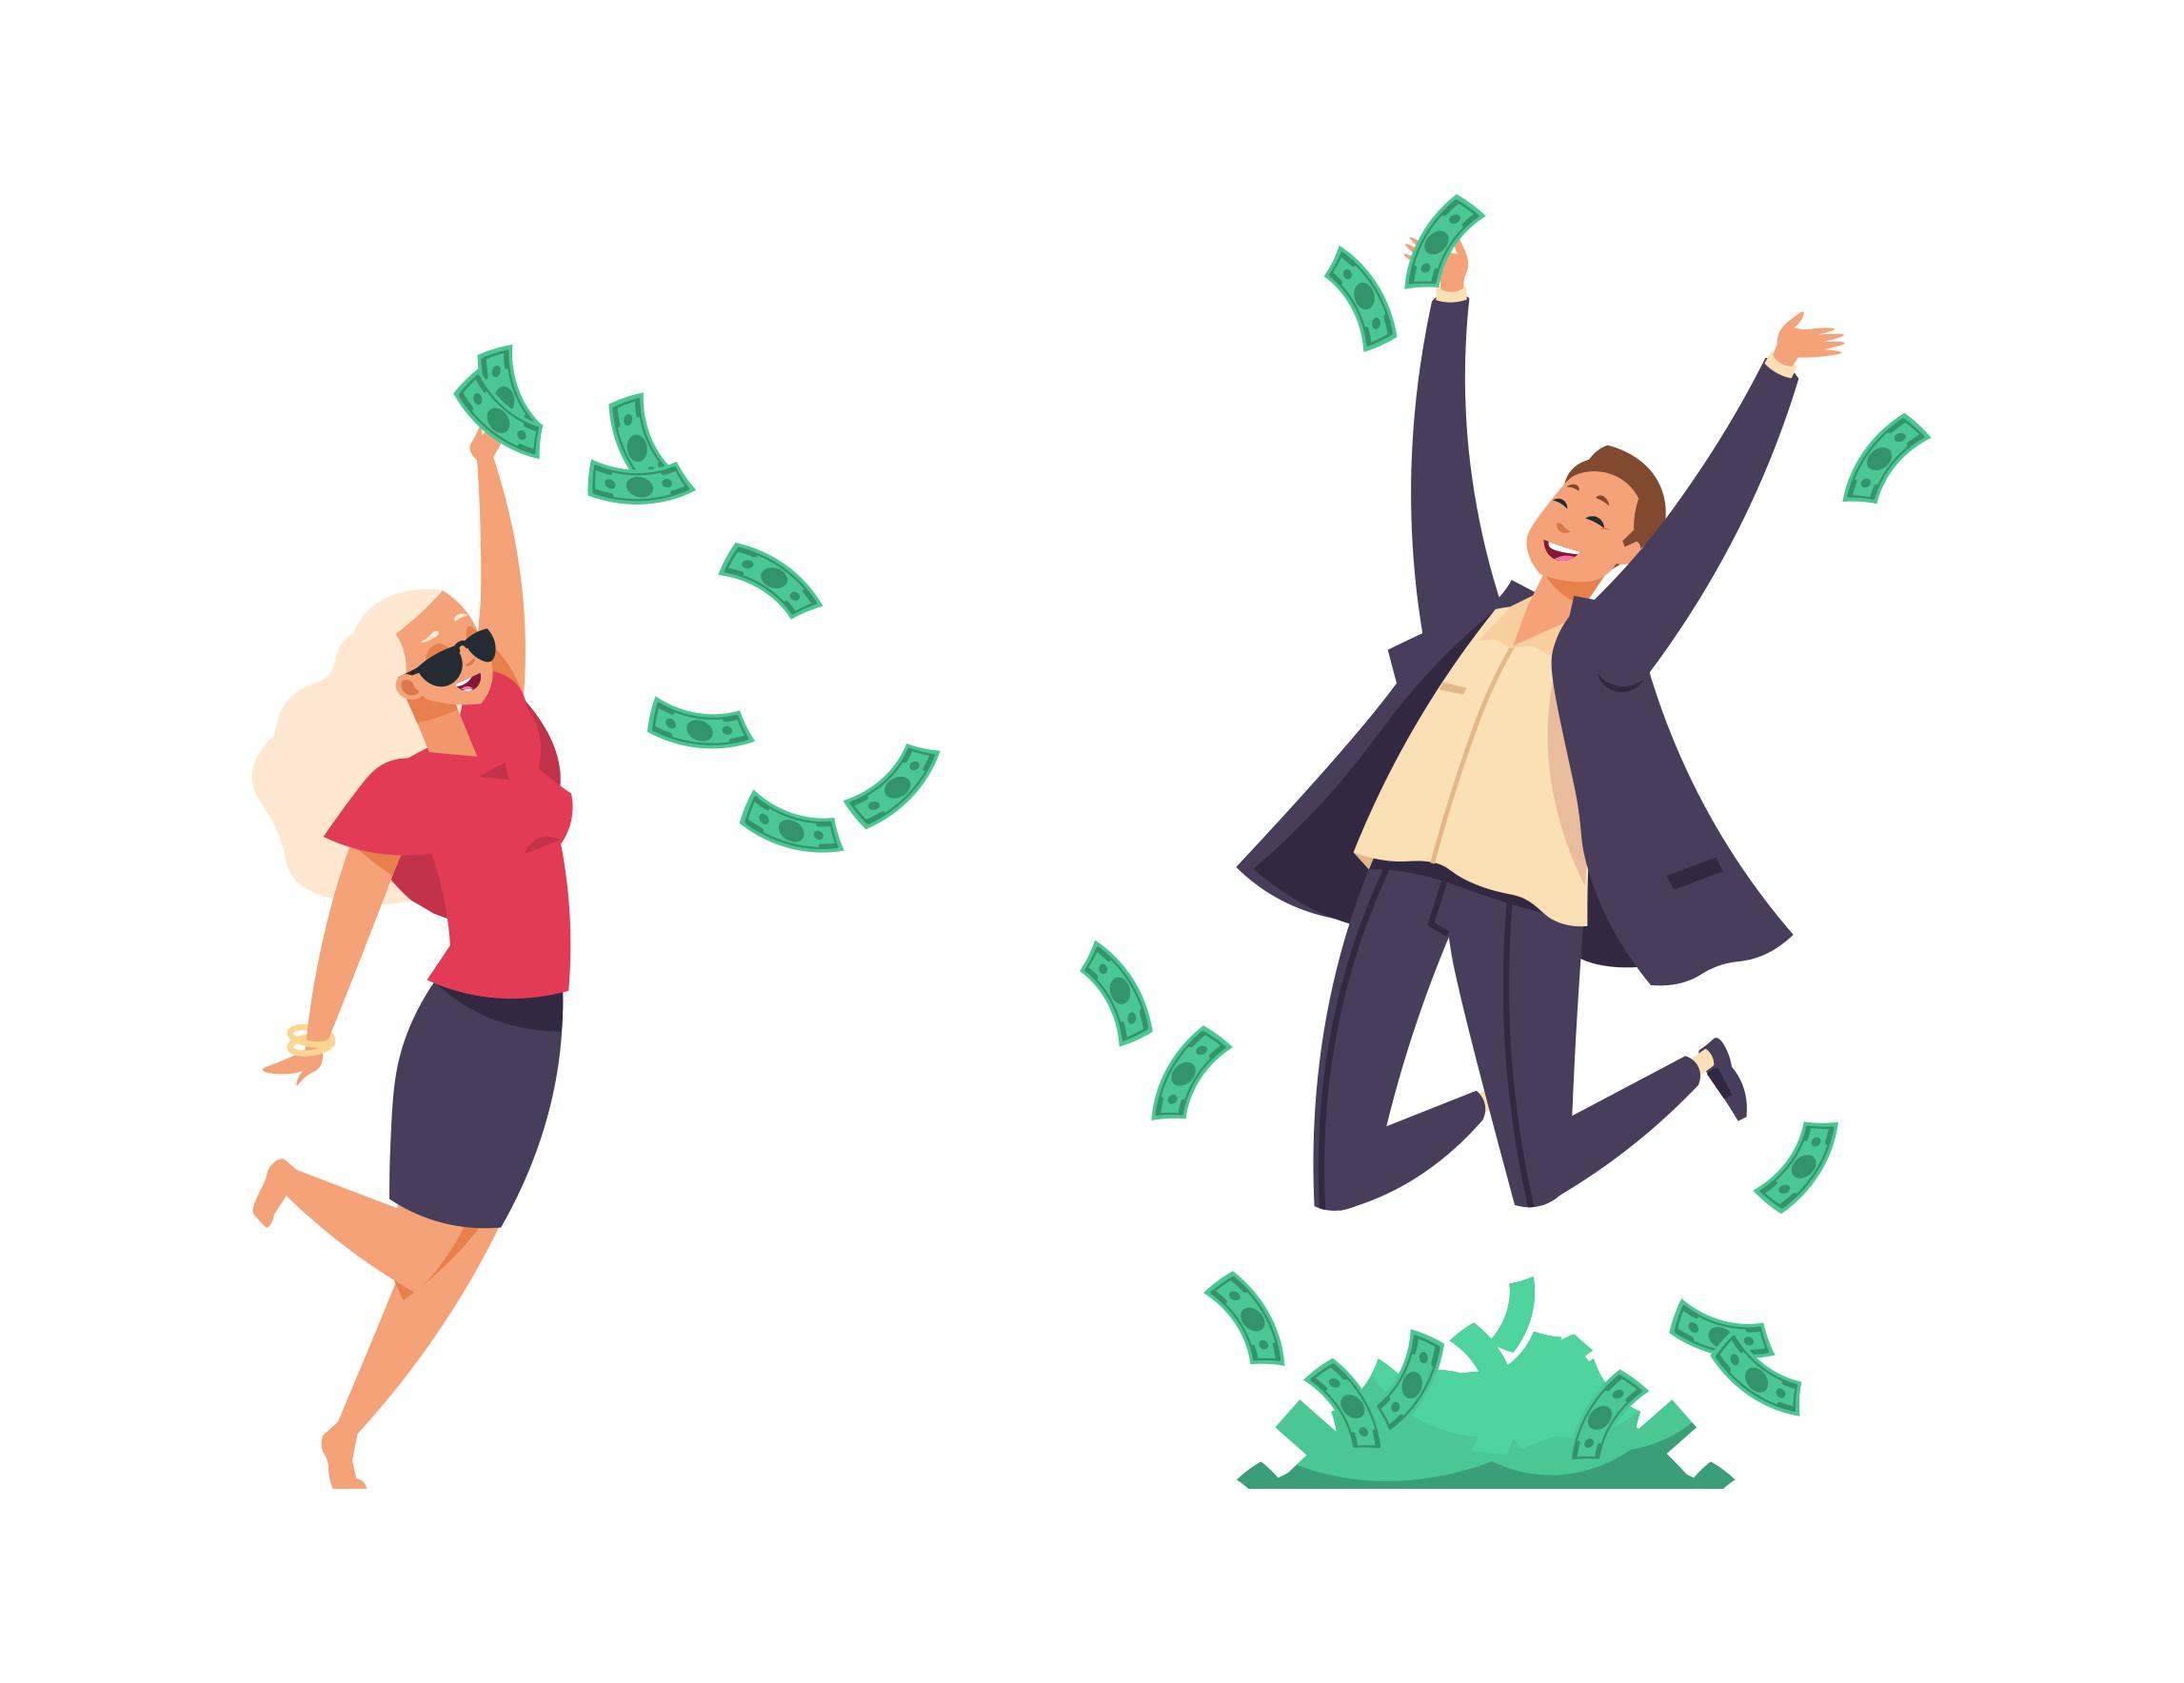 Does Saving Money Make You Happier?